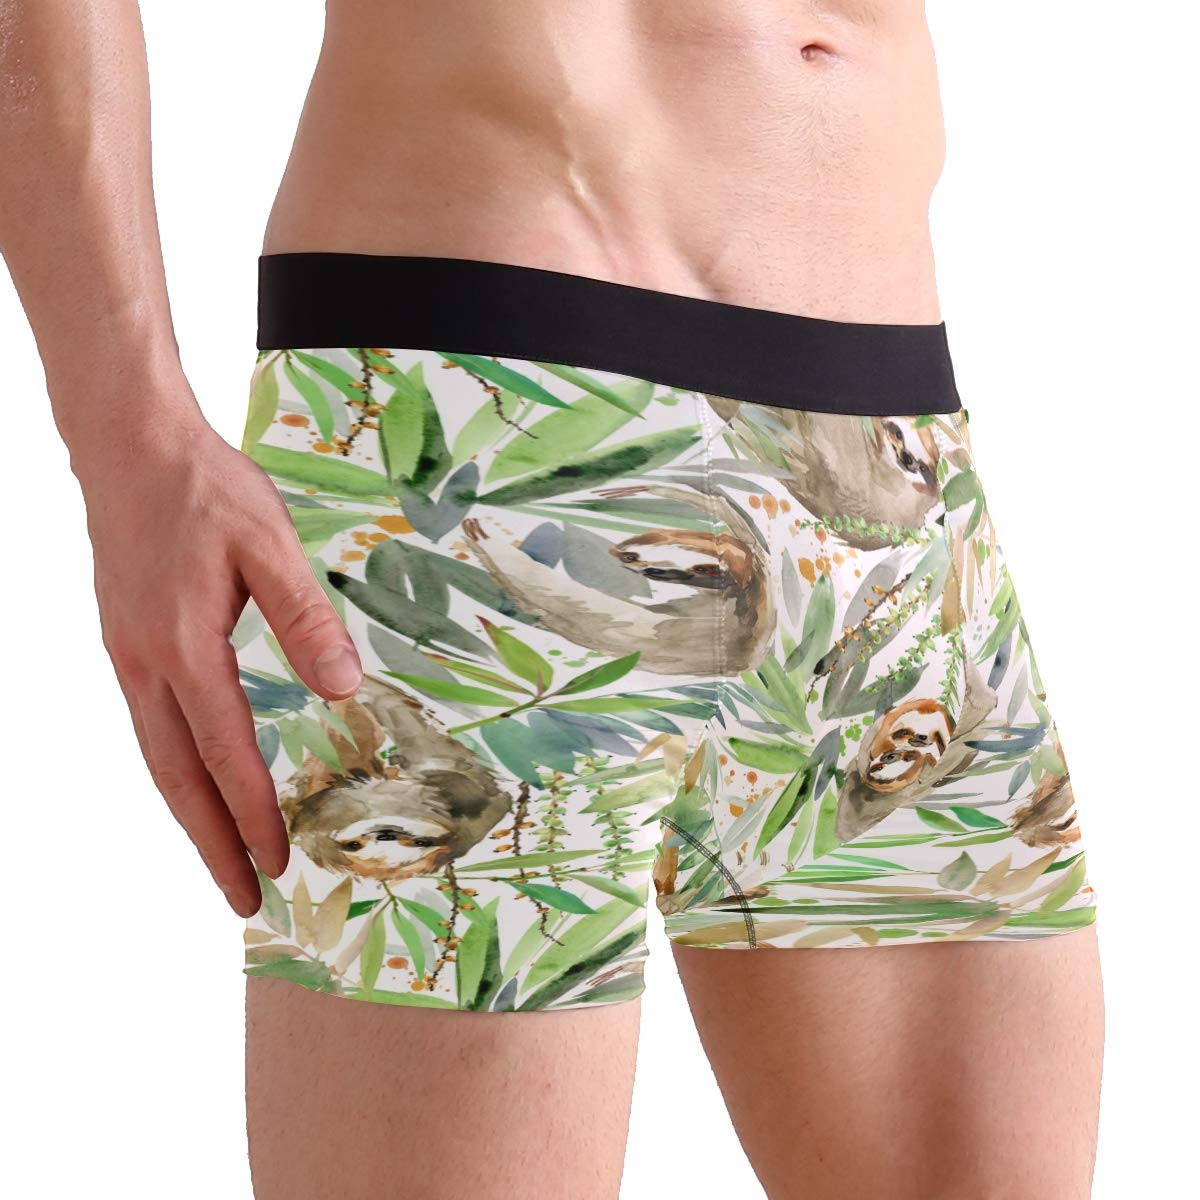 Sloth Men/'s Boxer Briefs Animal Green Underwear Stretchable S-XL